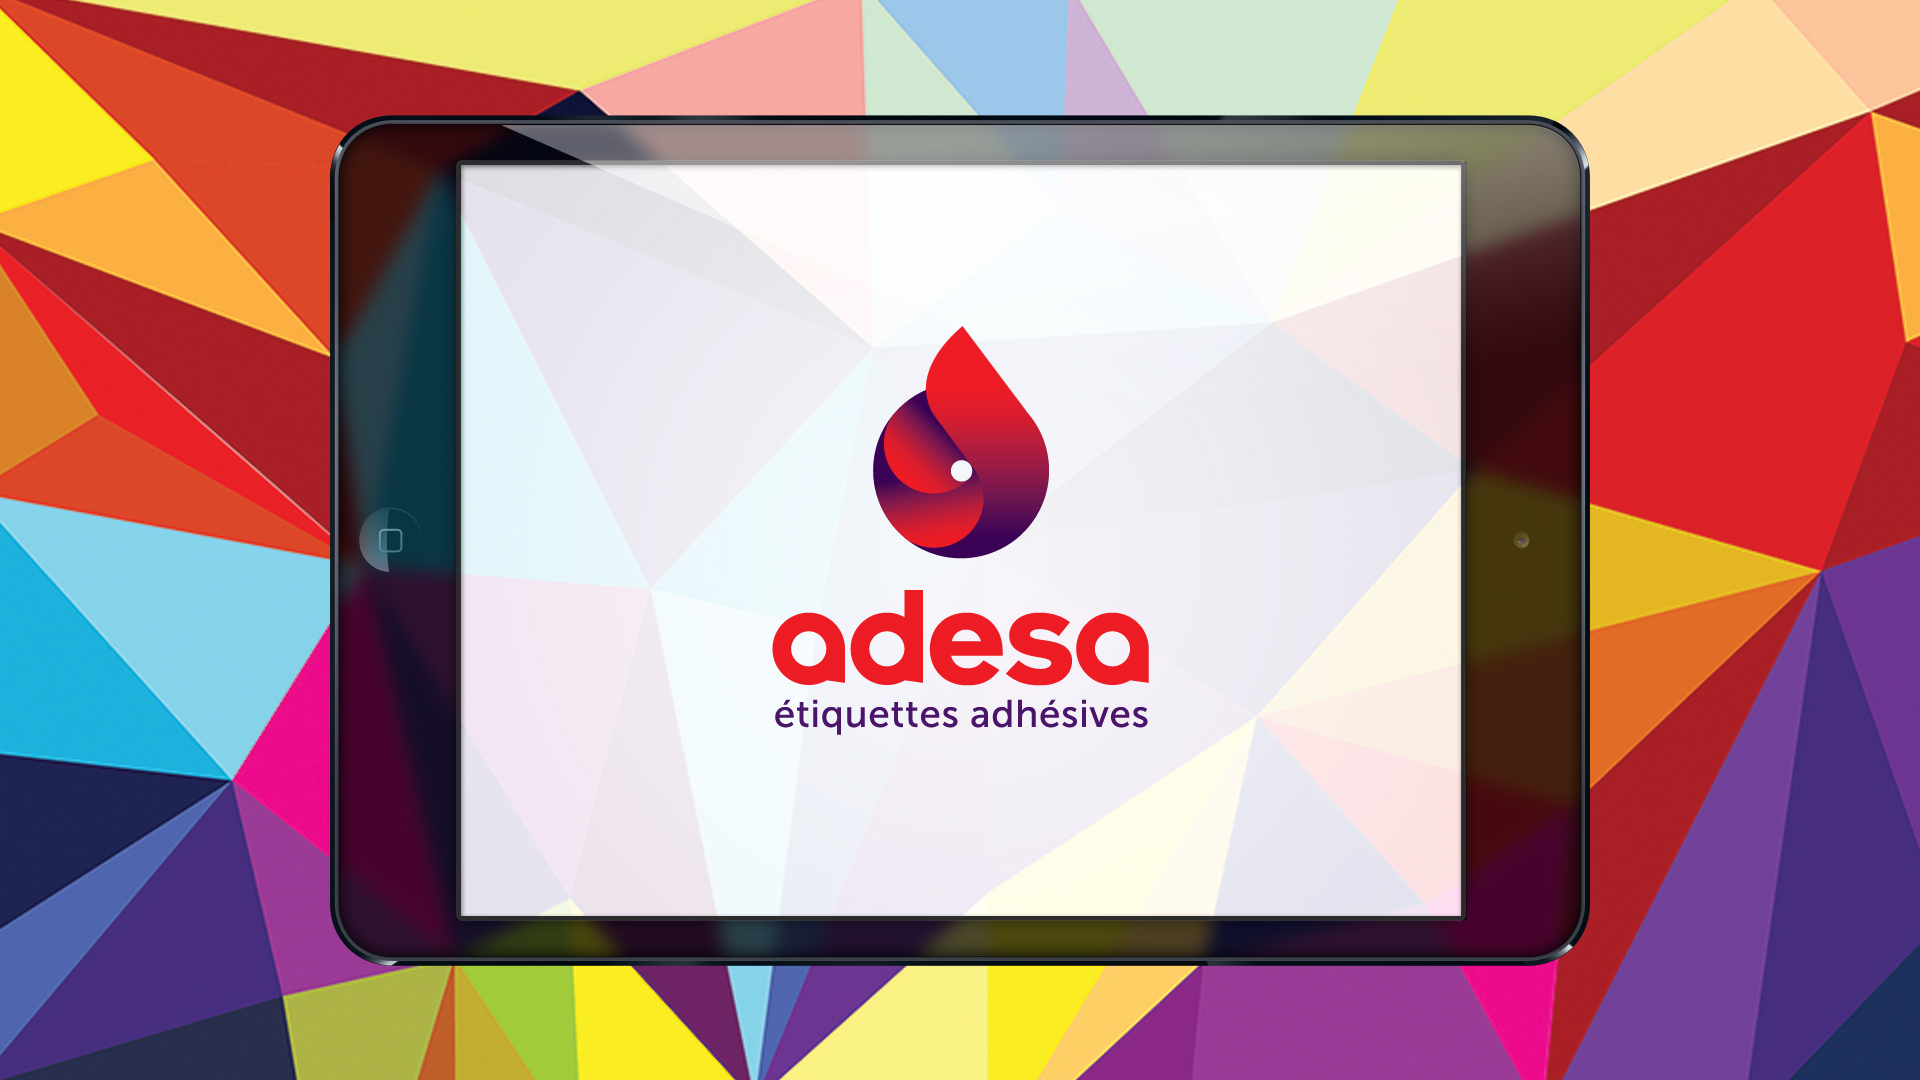 adesa-creation-logo-site-internet-print-animation-communication-globale-caconcept-alexis-cretin-graphiste-montpellier